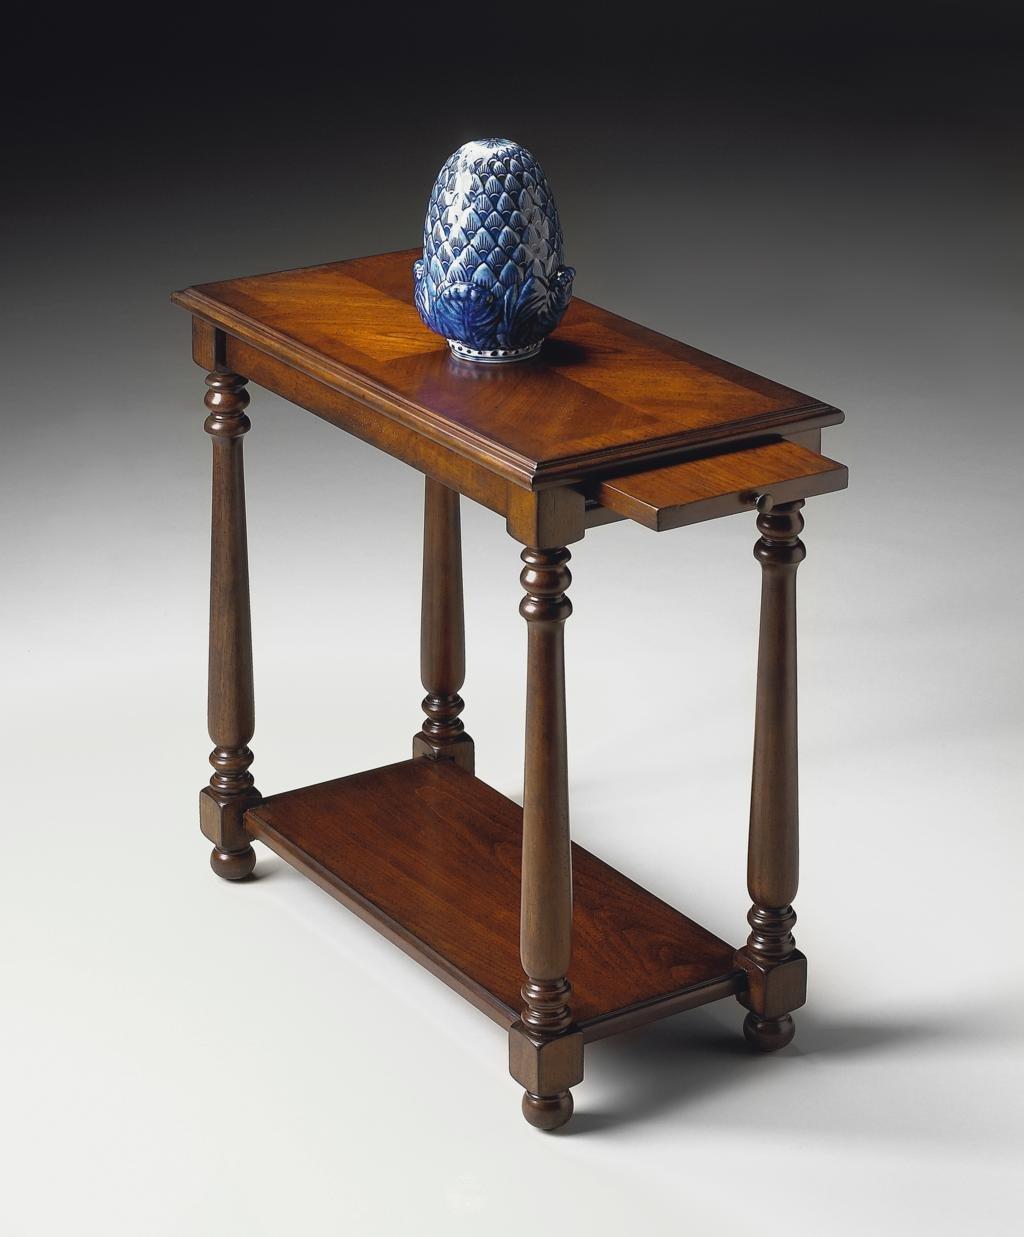 Amazon.com: WOYBR 5017024 Plantation Cherry Chairside Table: Kitchen U0026  Dining